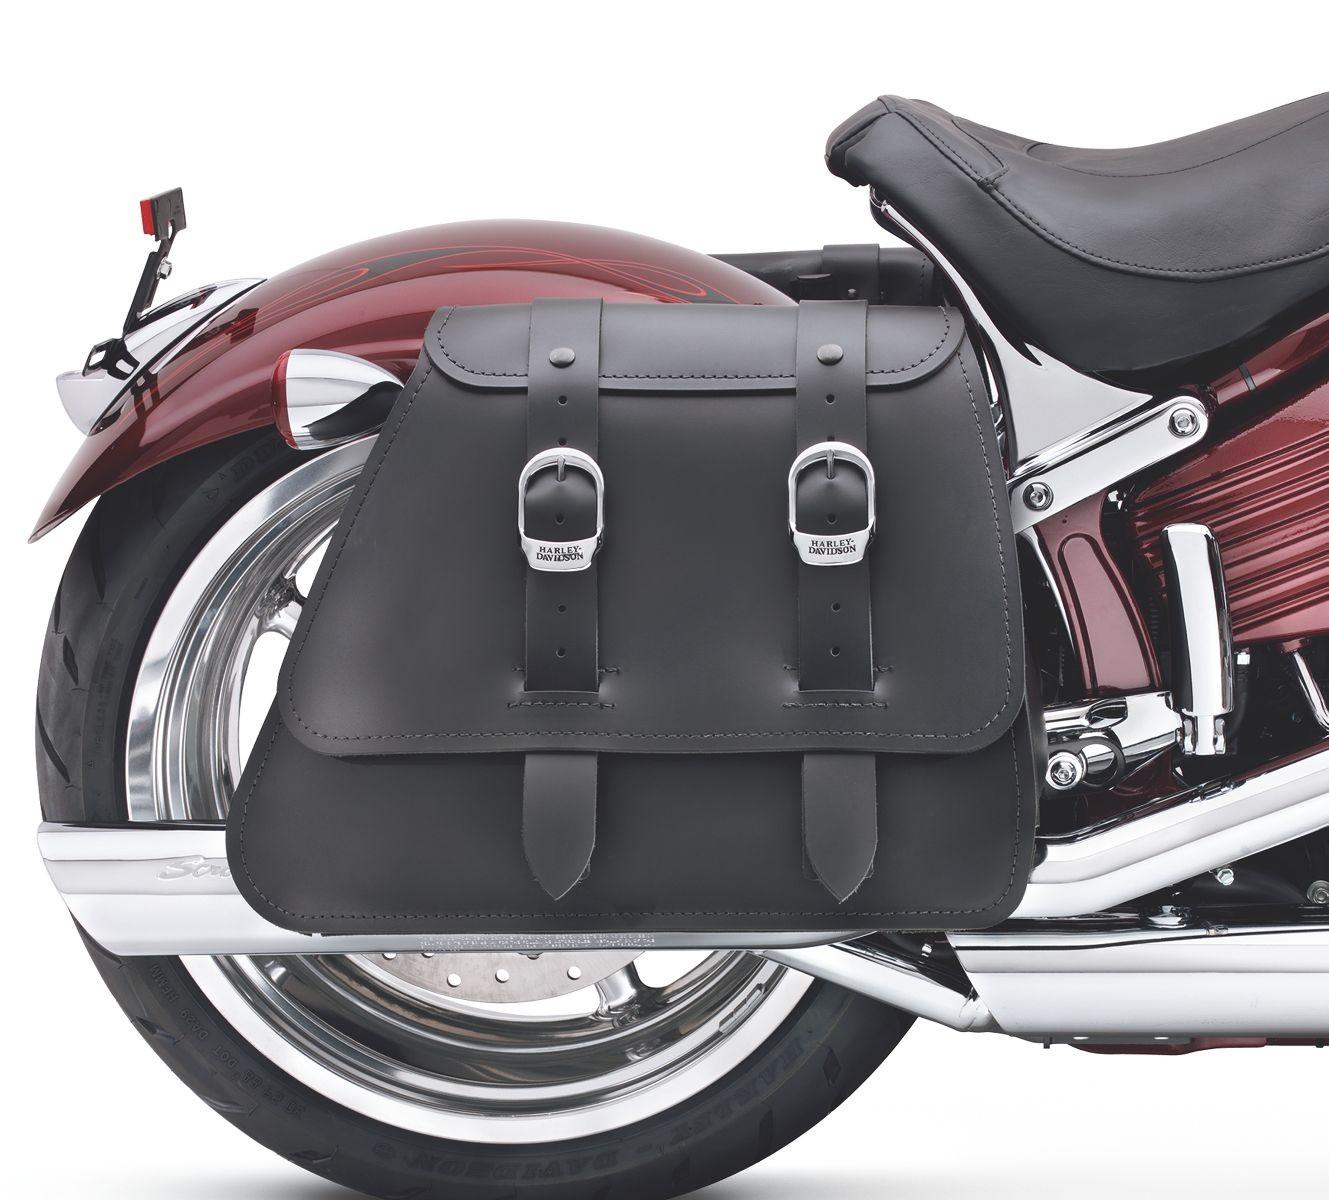 90240 08 Harley Davidson Leather Saddlebags Chester Protectant